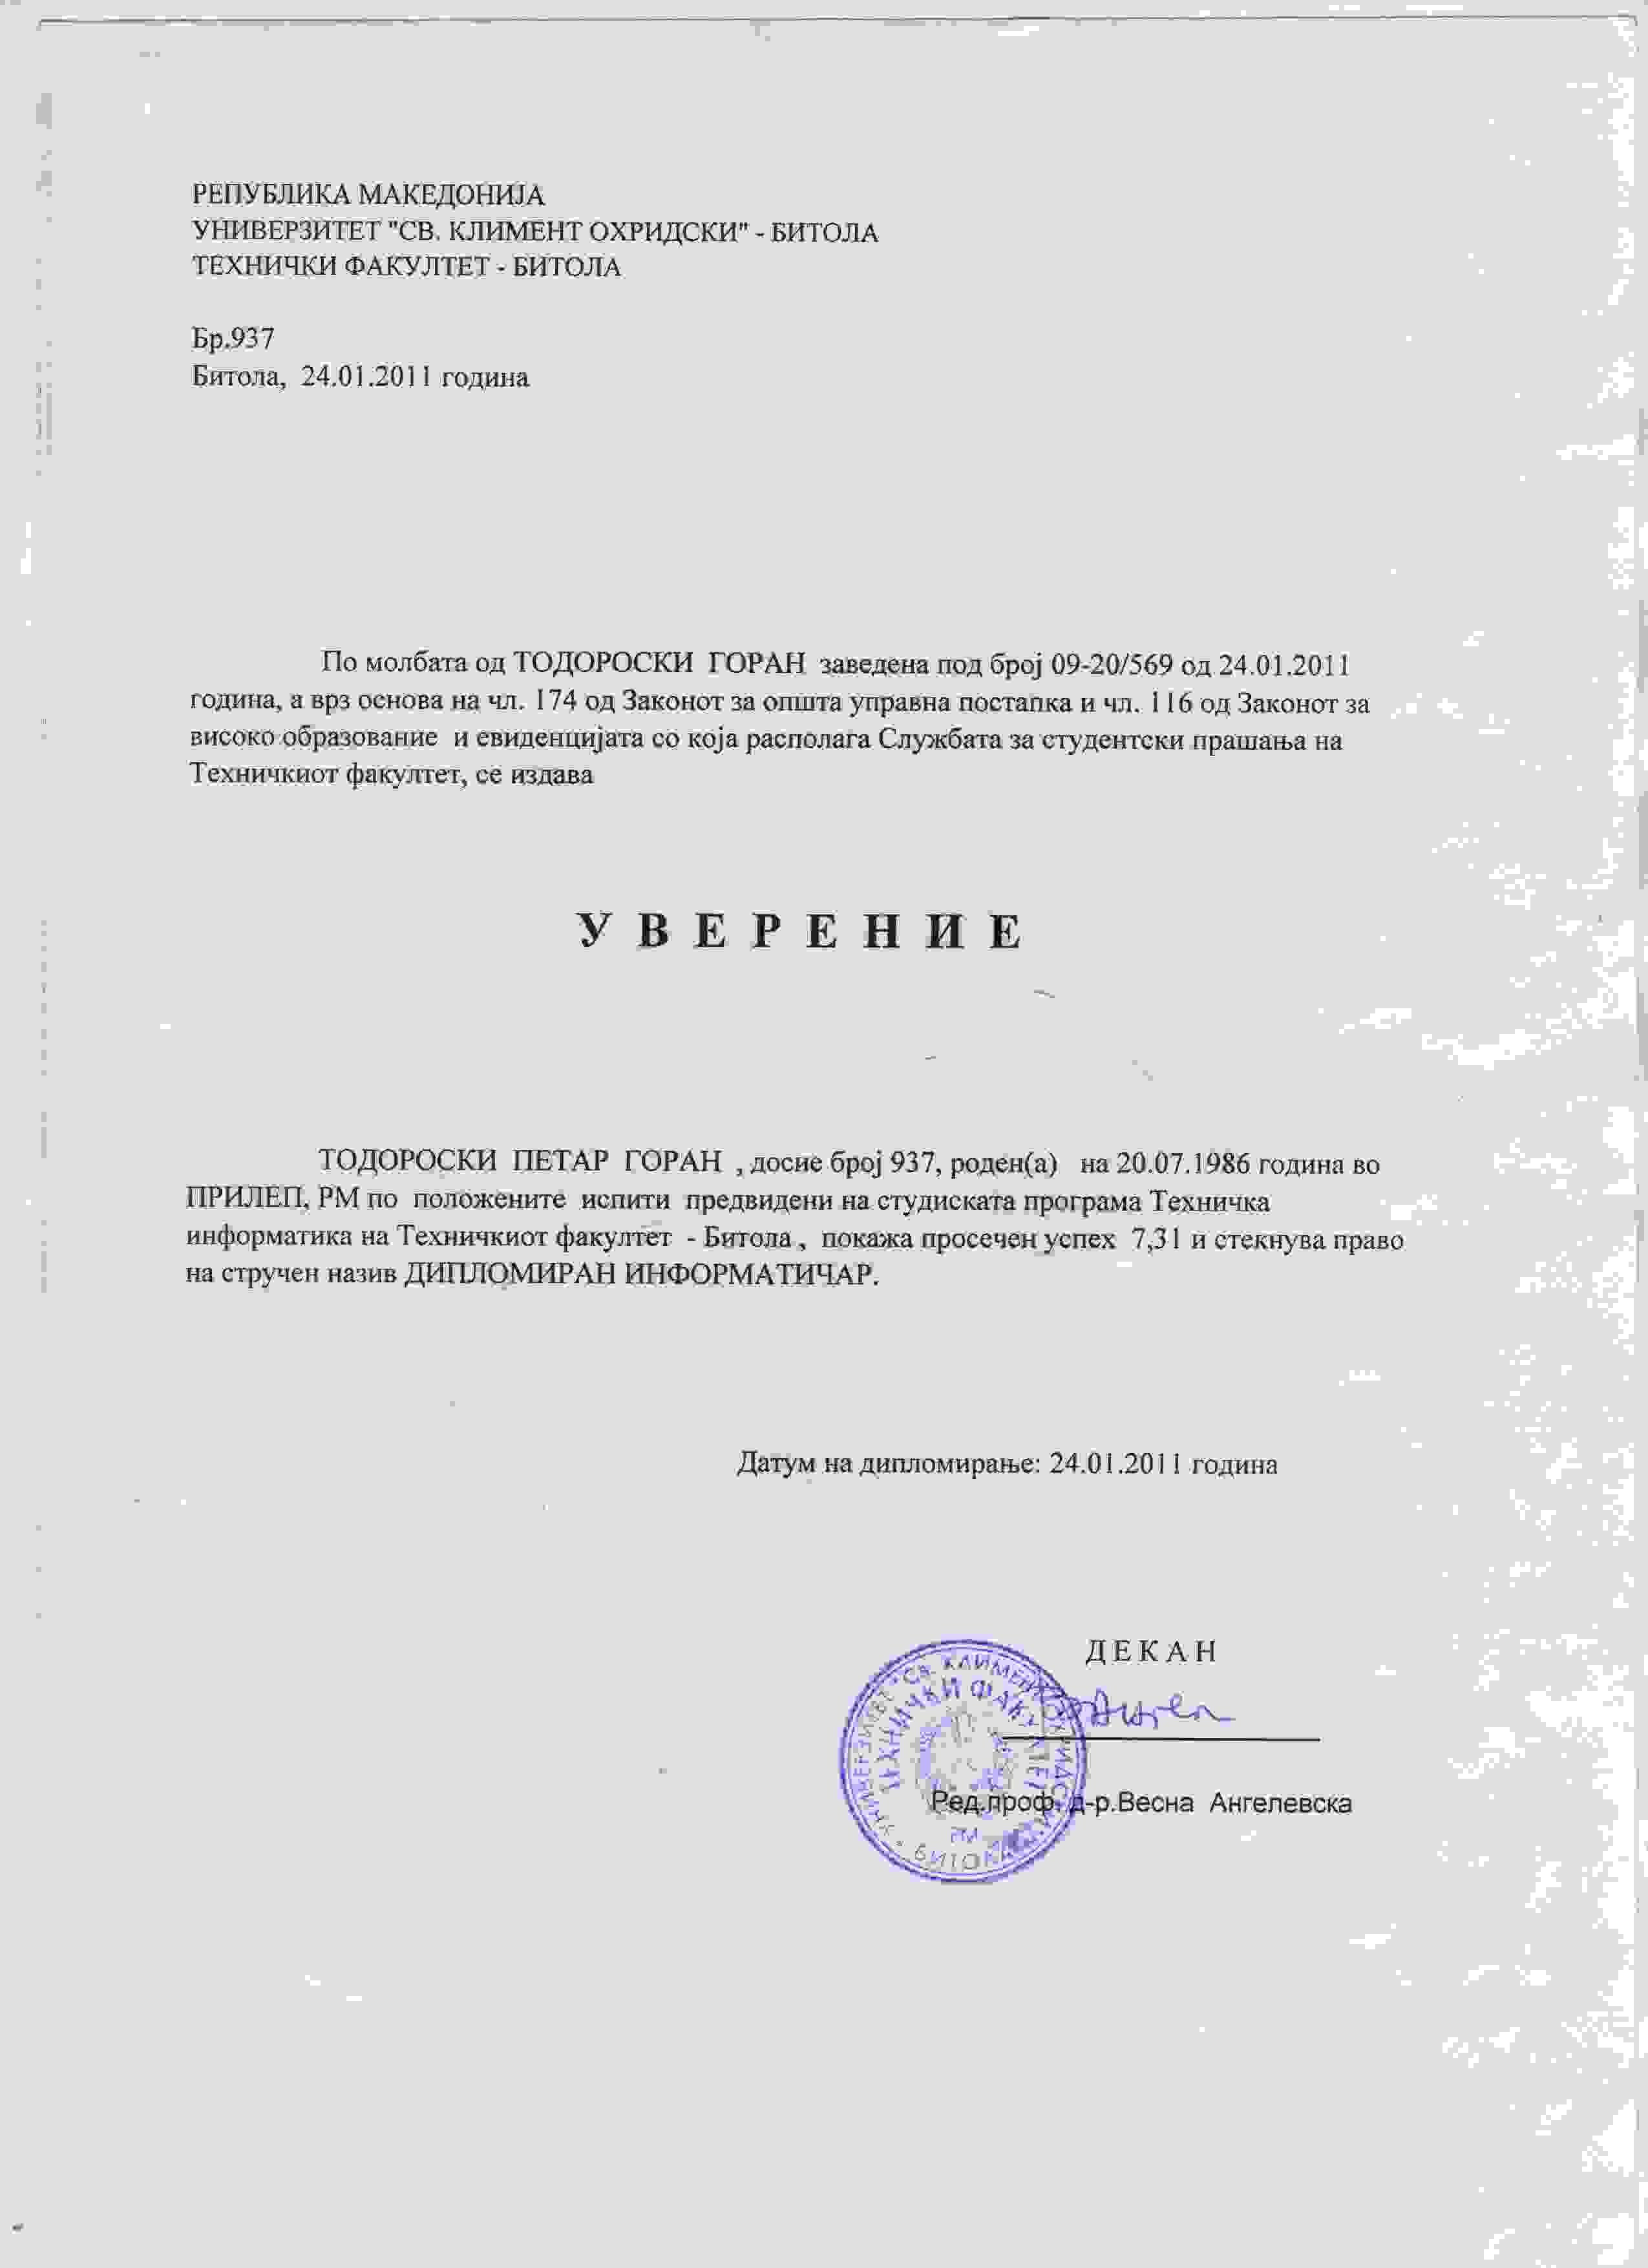 Faculty diploma